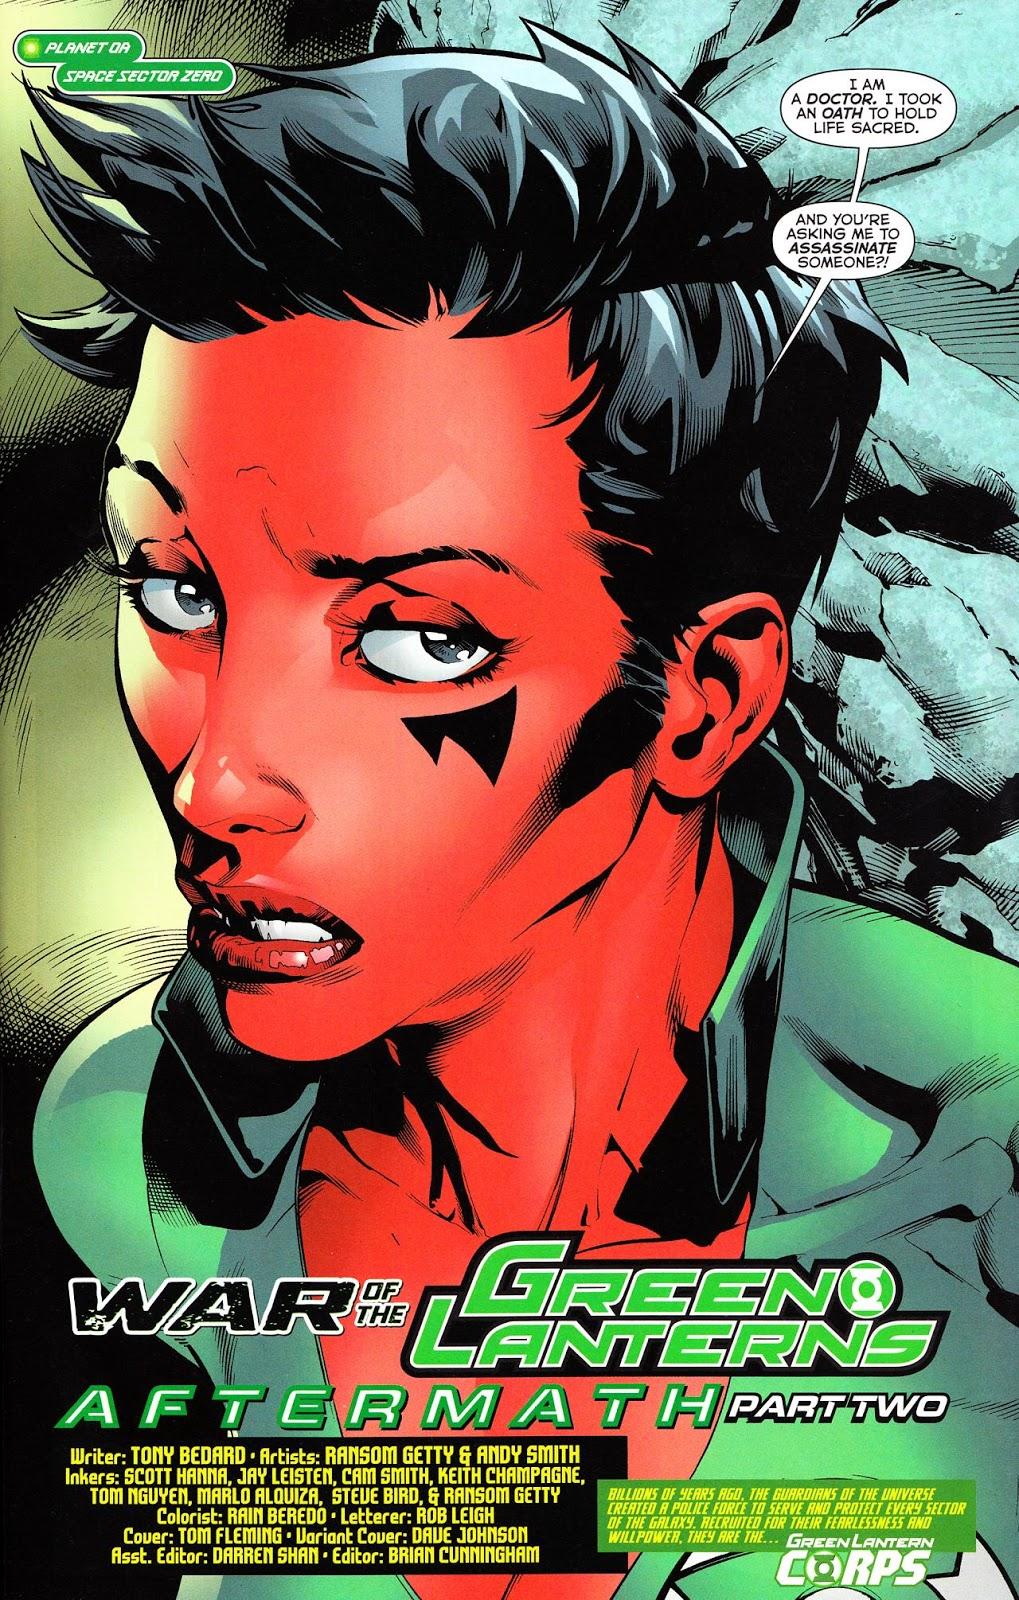 Soranik Natu (War of the Green Lanterns Aftermath #2)